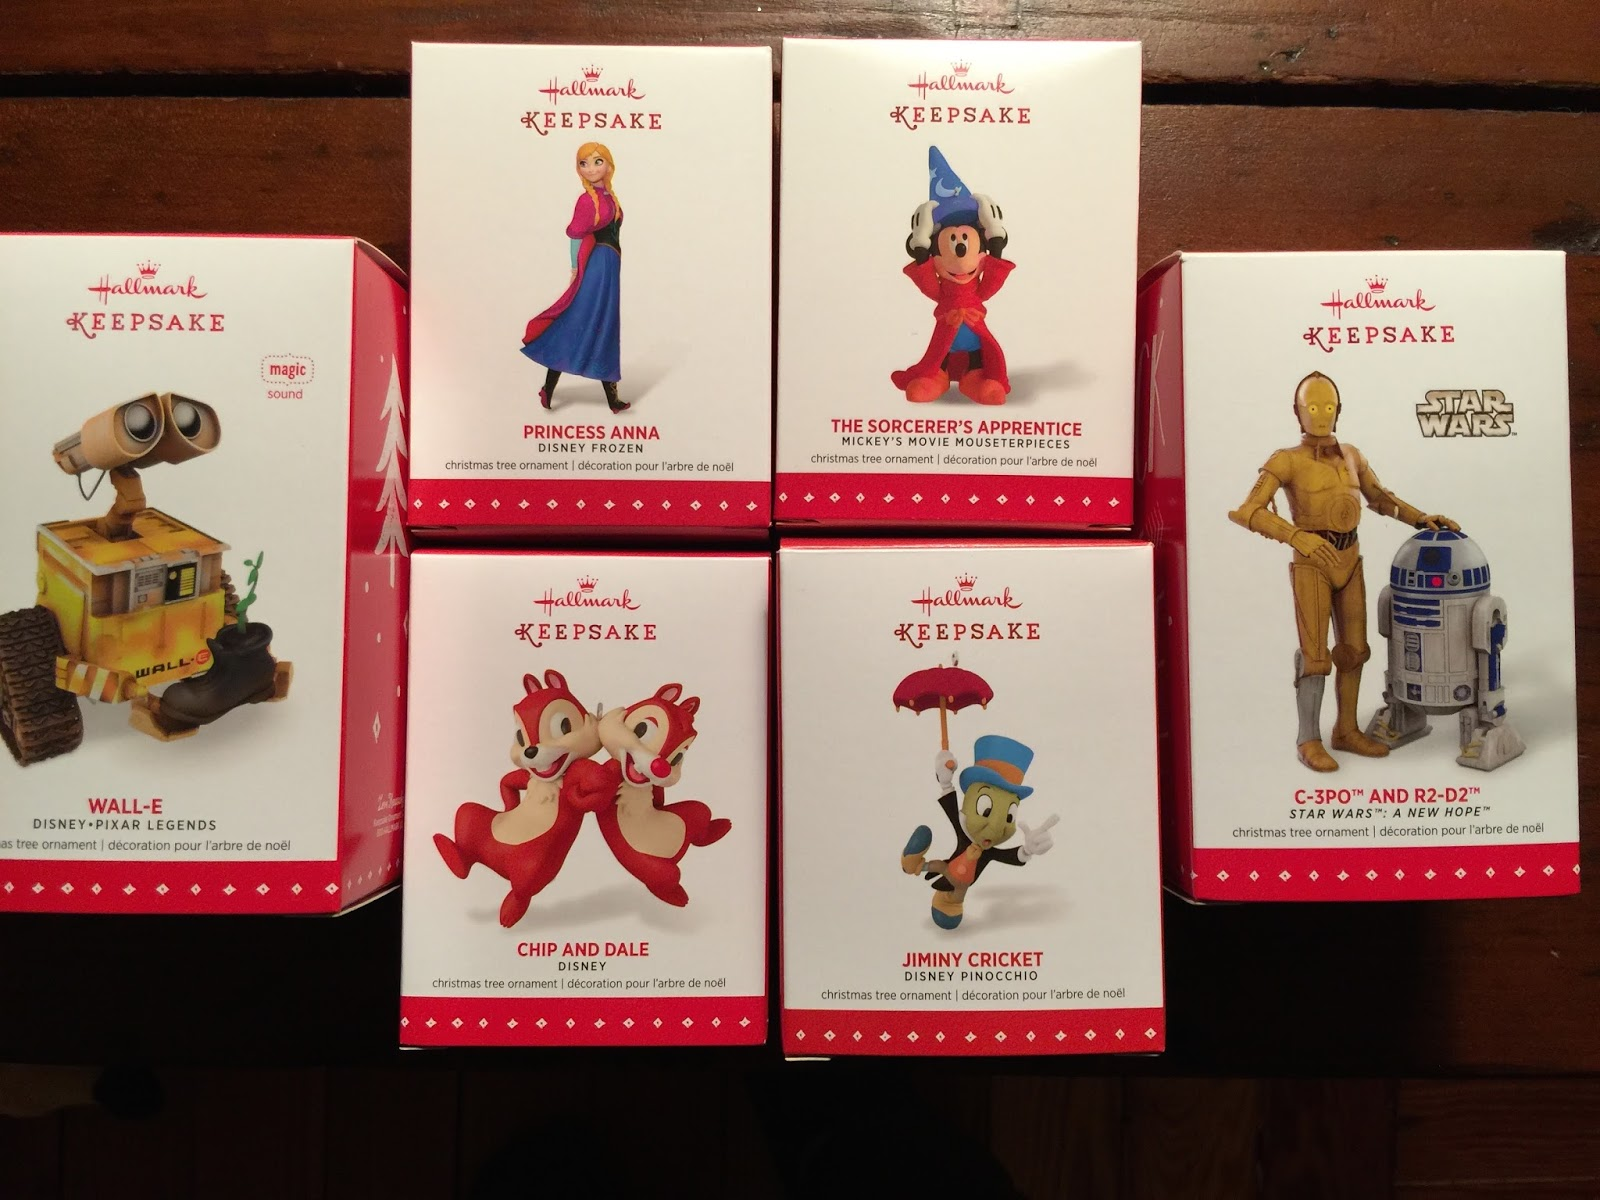 Disney Christmas Ornaments: 2015 Edition